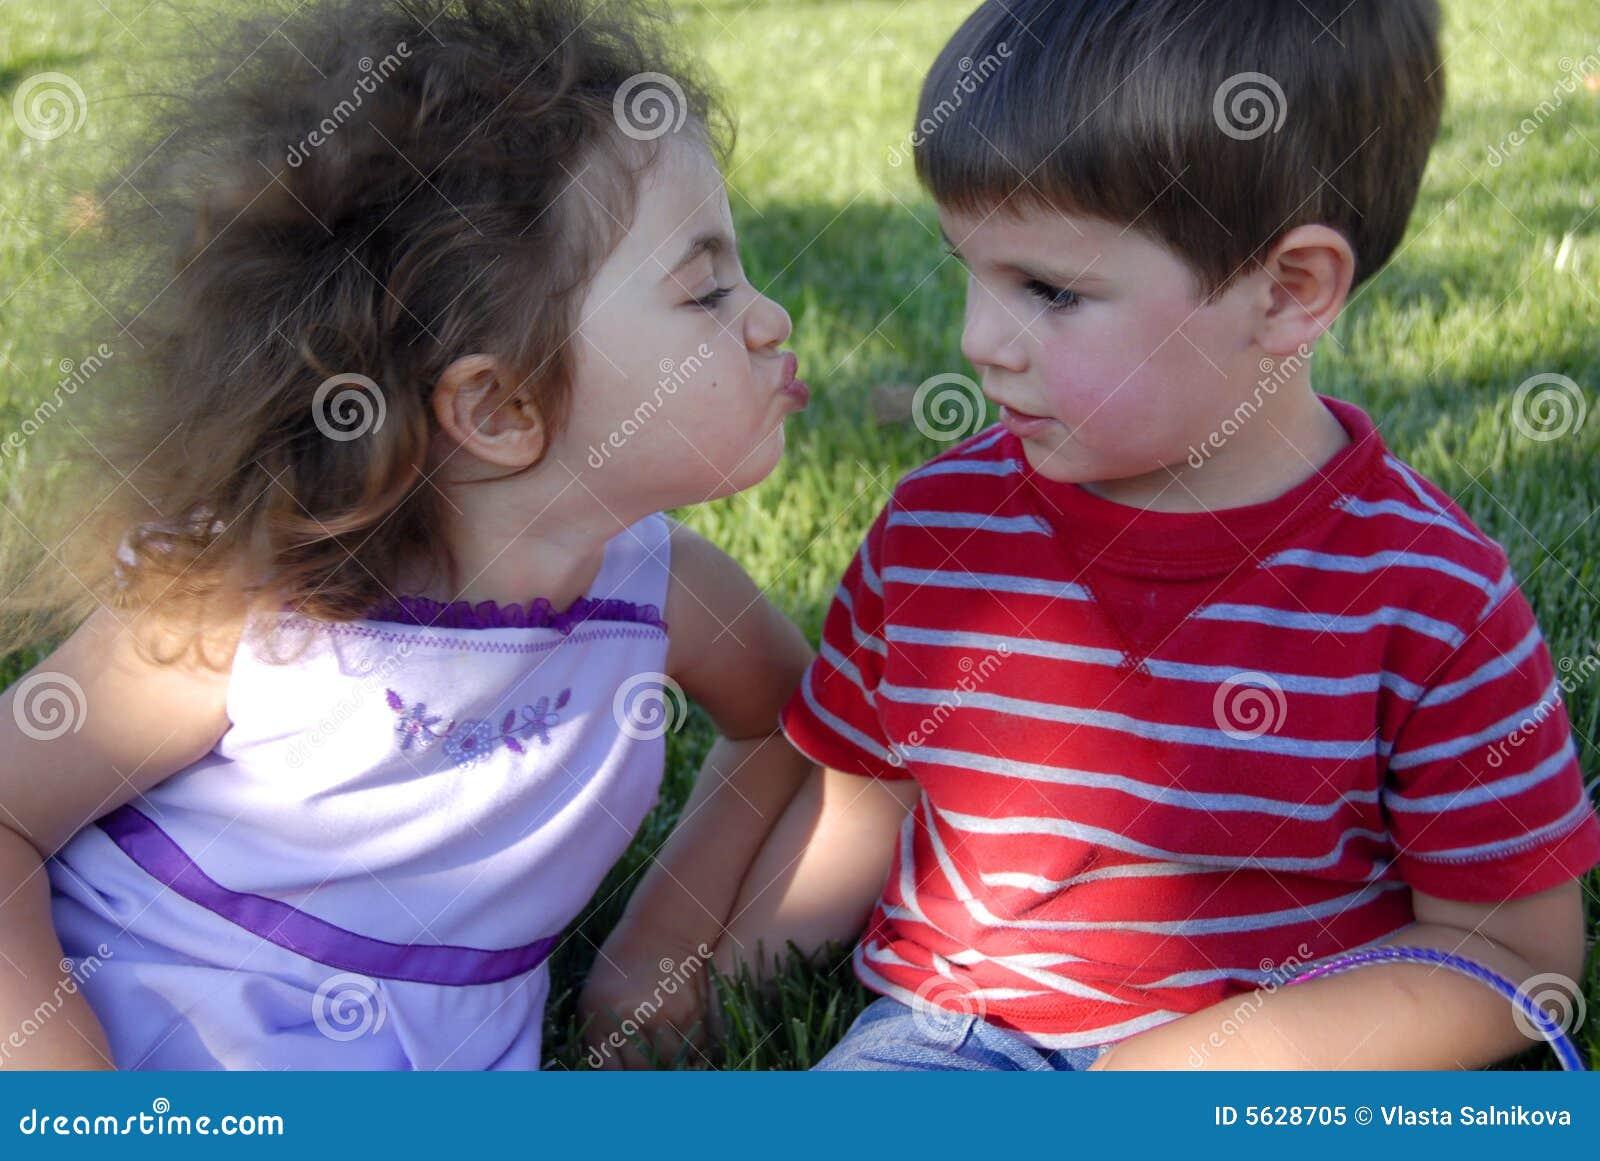 Z Berg First Kiss The First Kiss ...